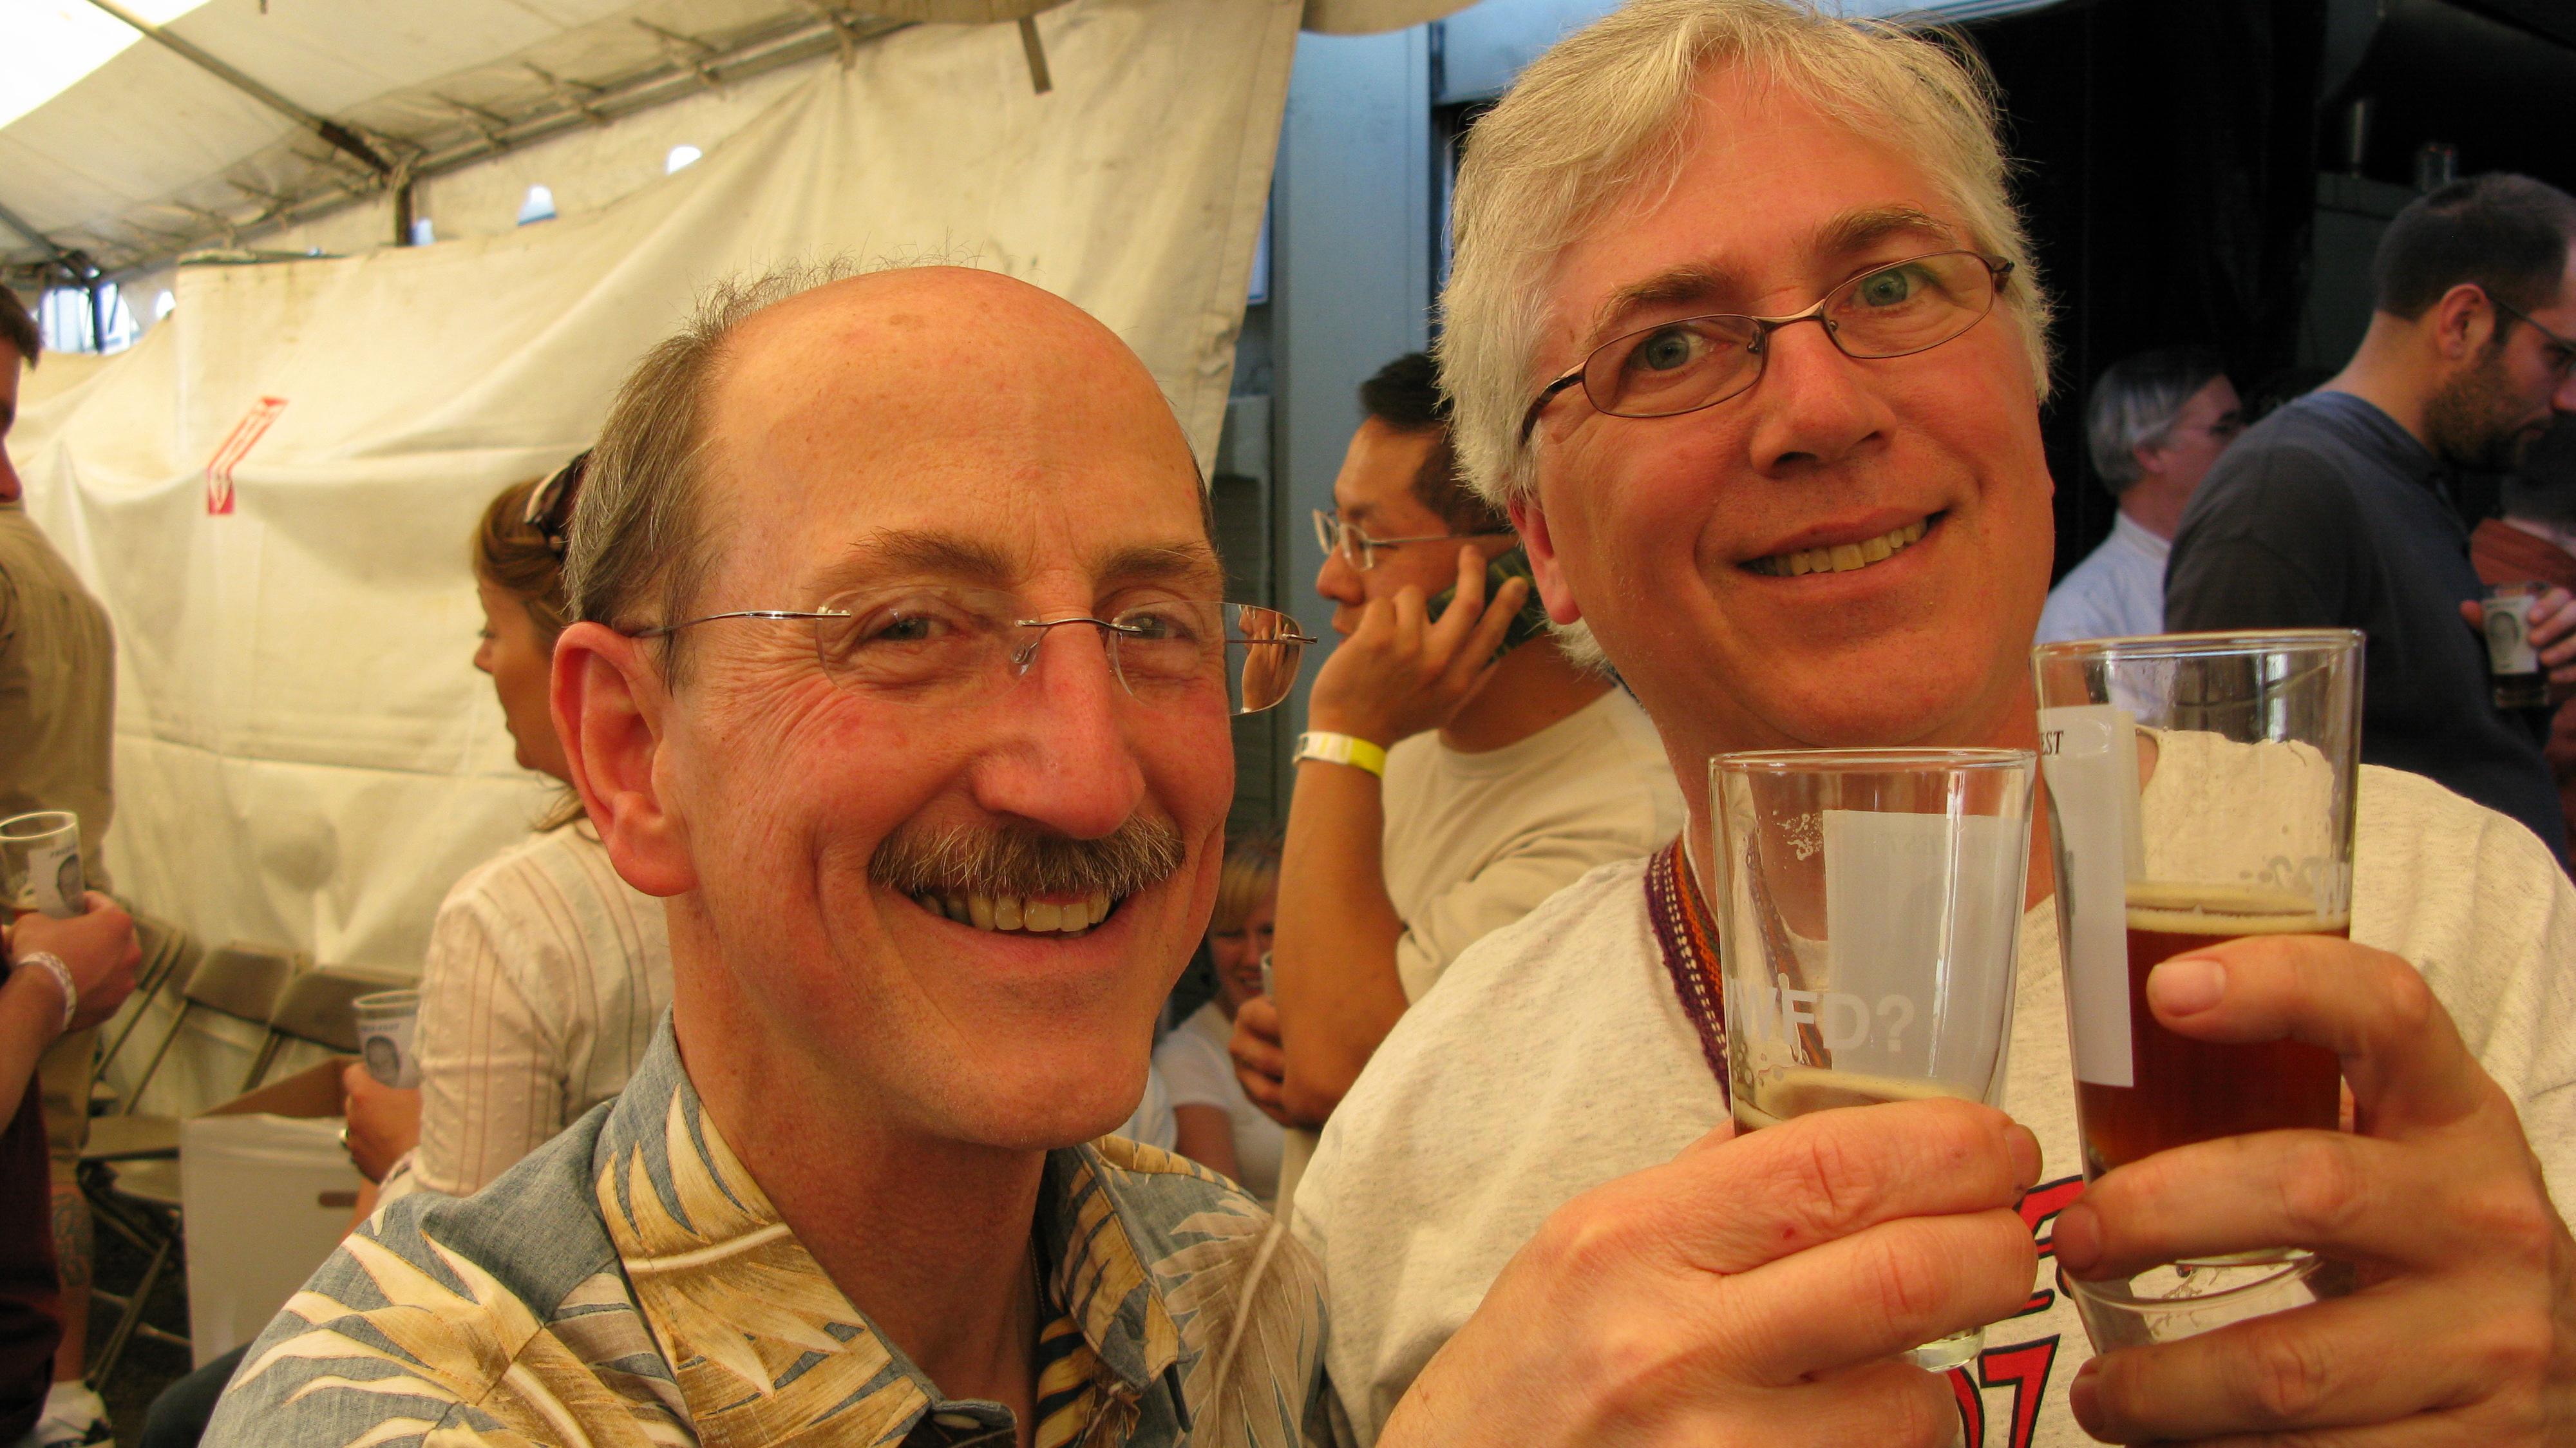 Mike Moscarelli and Noel Blake. (FoystonFoto)